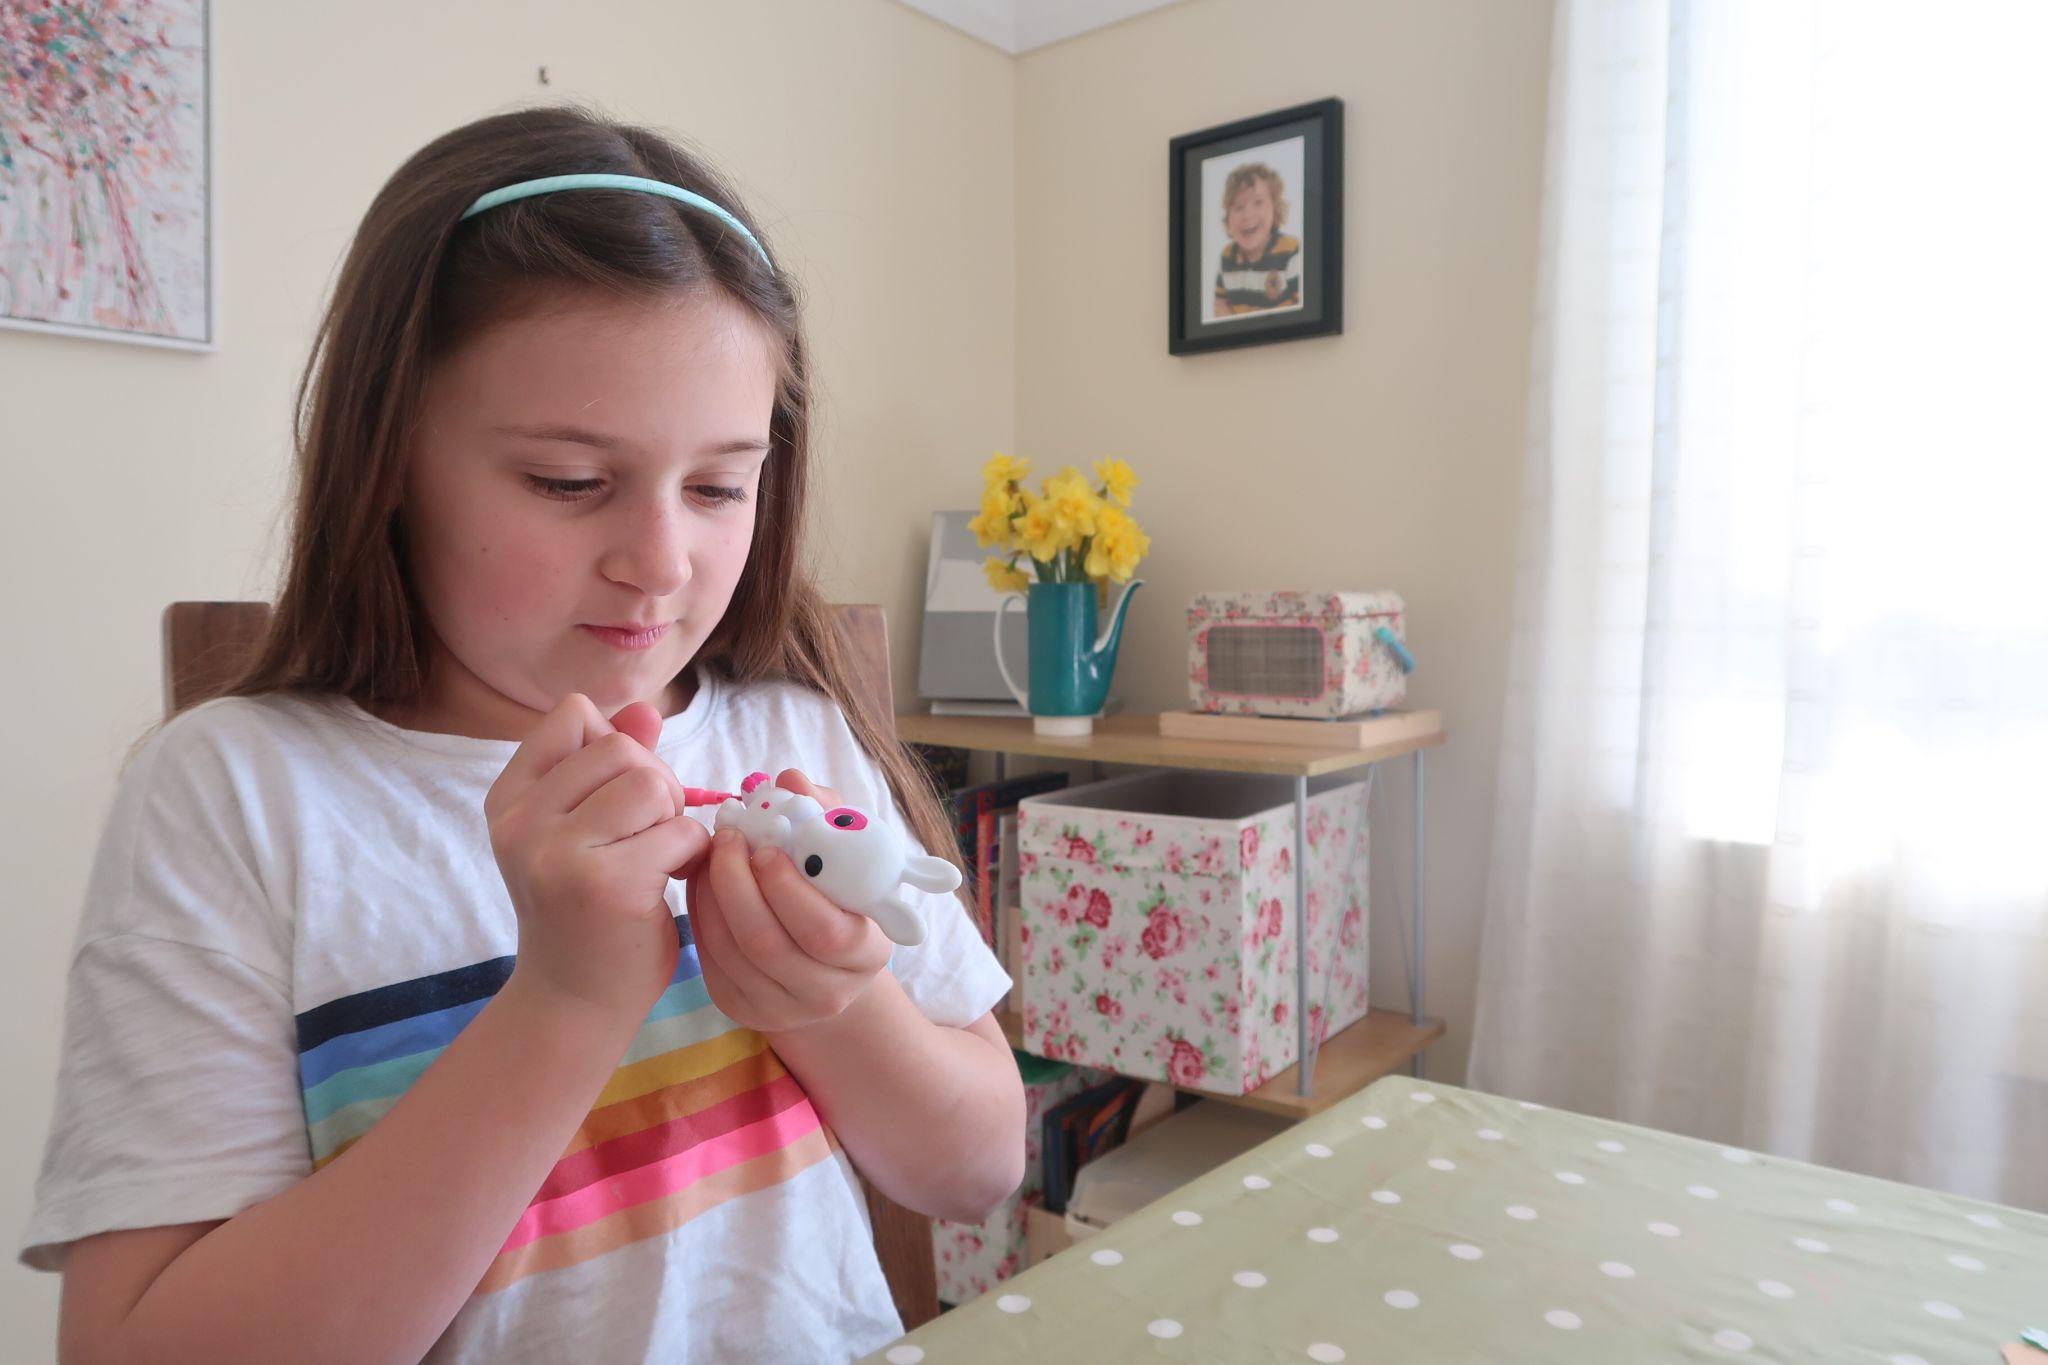 A girl painting a bunny figurine